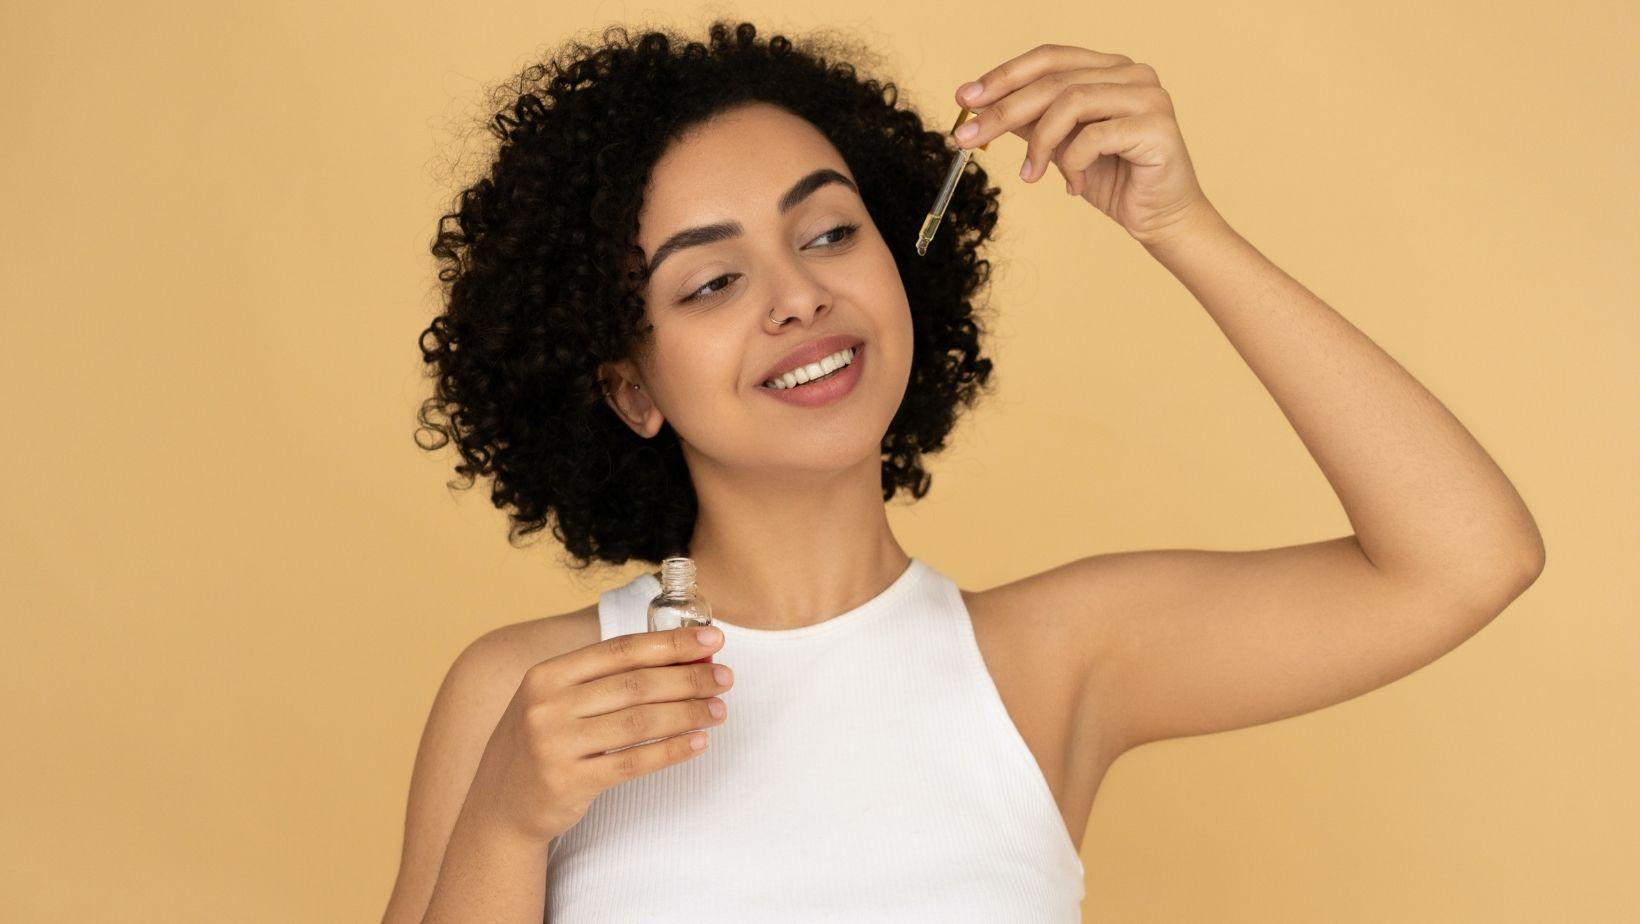 Kenali Manfaat Peppermint Oil Untuk Kecantikan